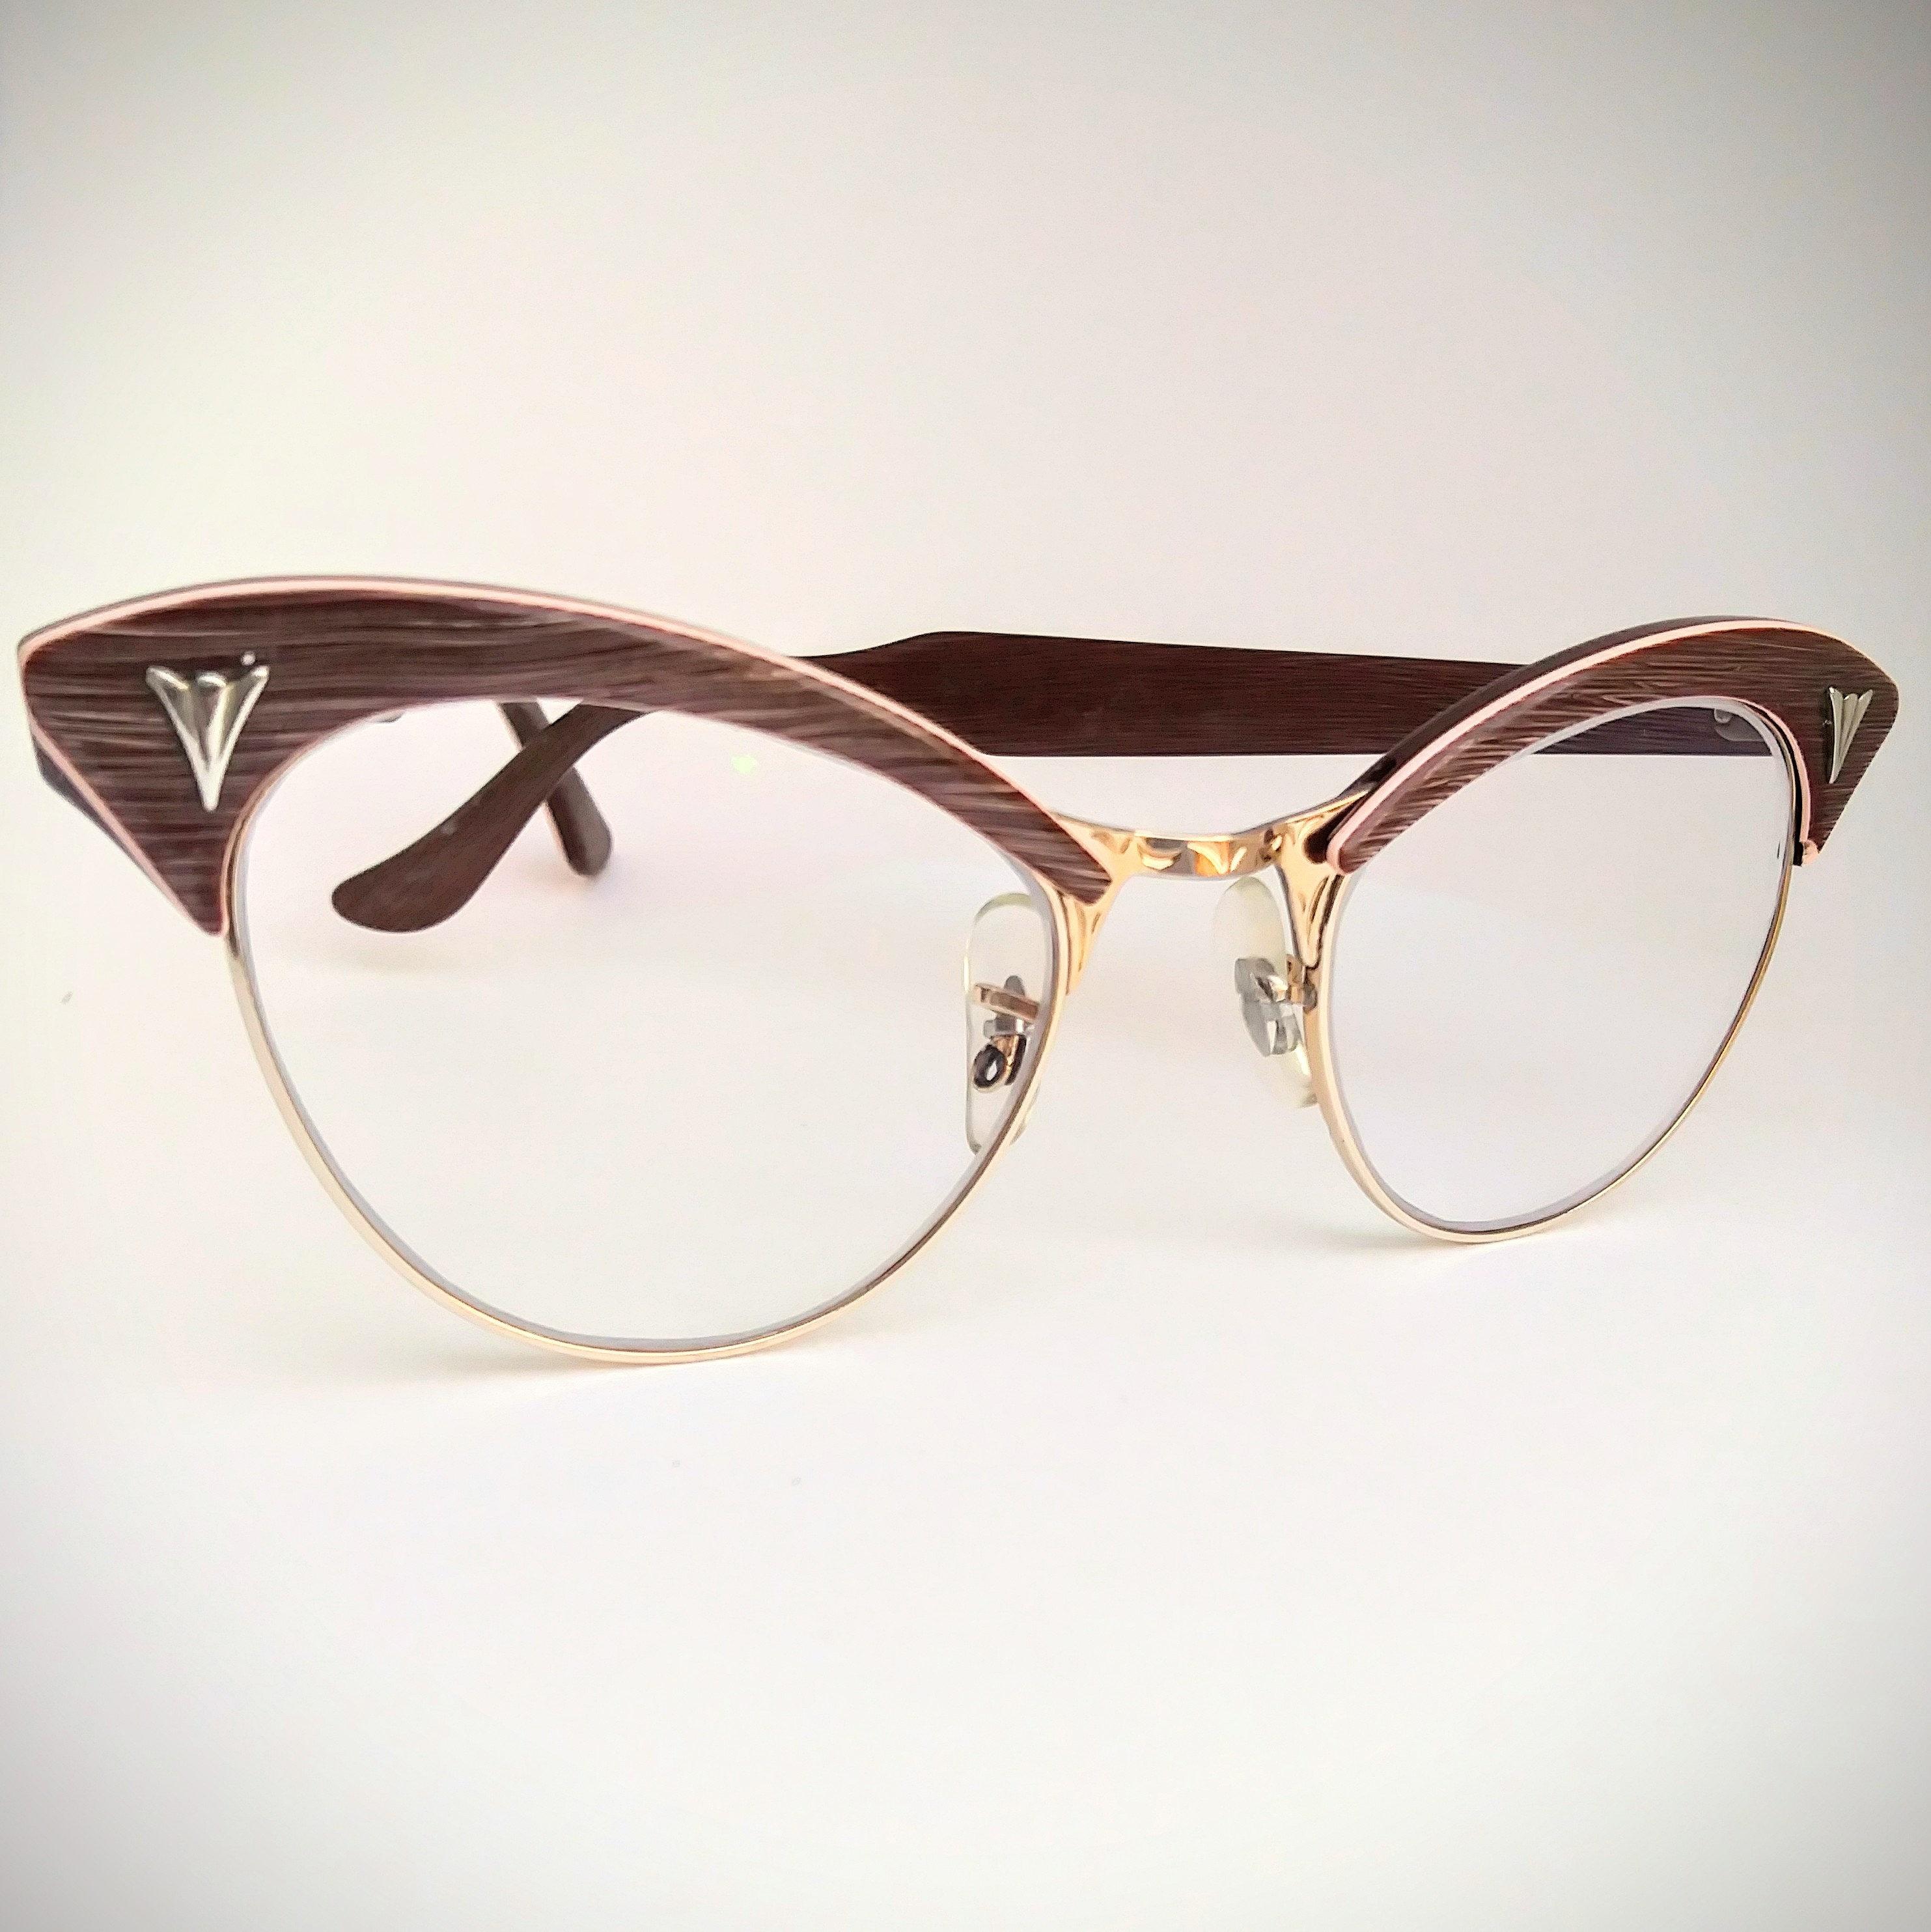 fdd895dba6 American Optical Non-Prescription Vintage Eyeglasses with Non-Glare Lenses   Ready-to-Wear